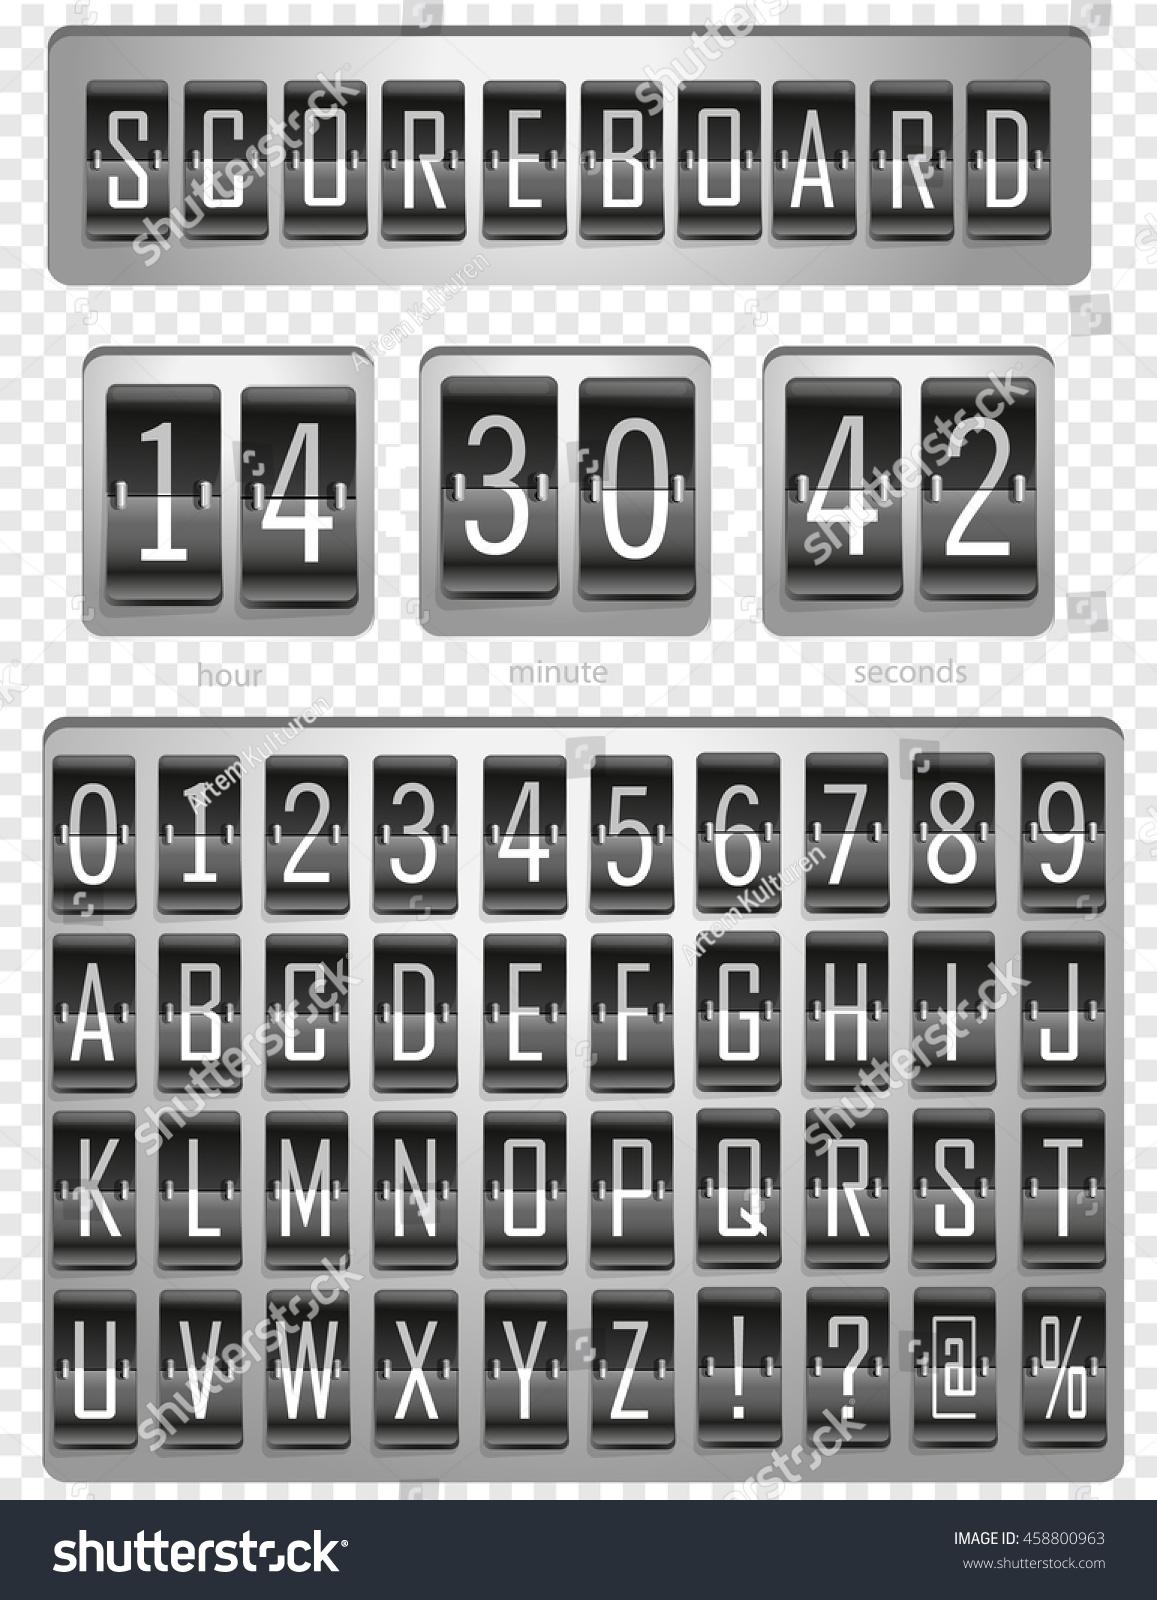 Vintage Scoreboard Time Analog Display Panel Stock Vector